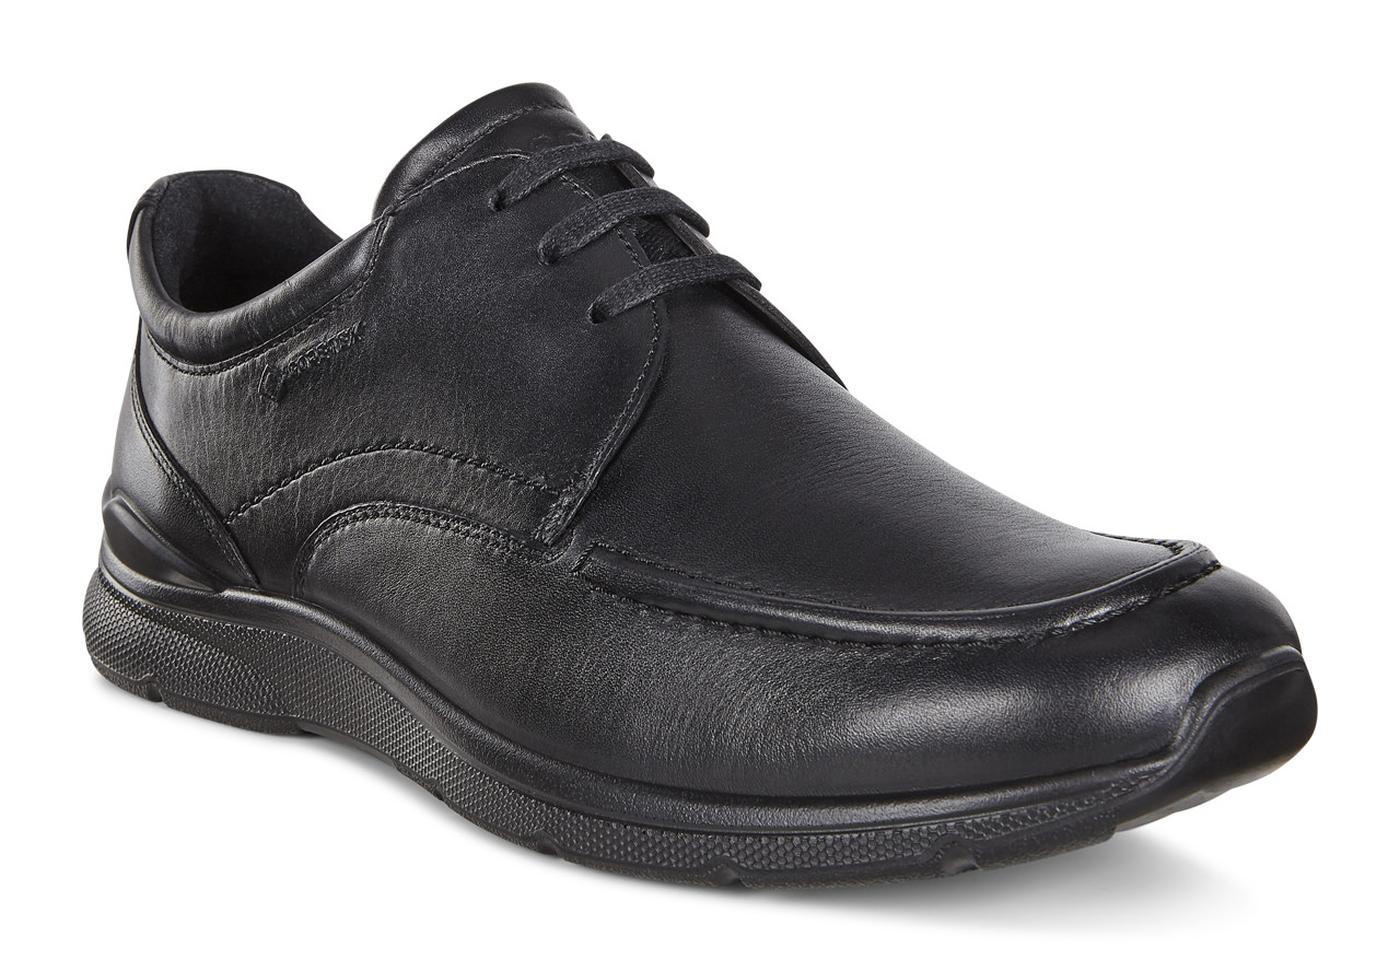 ECCO IRVING Shoe